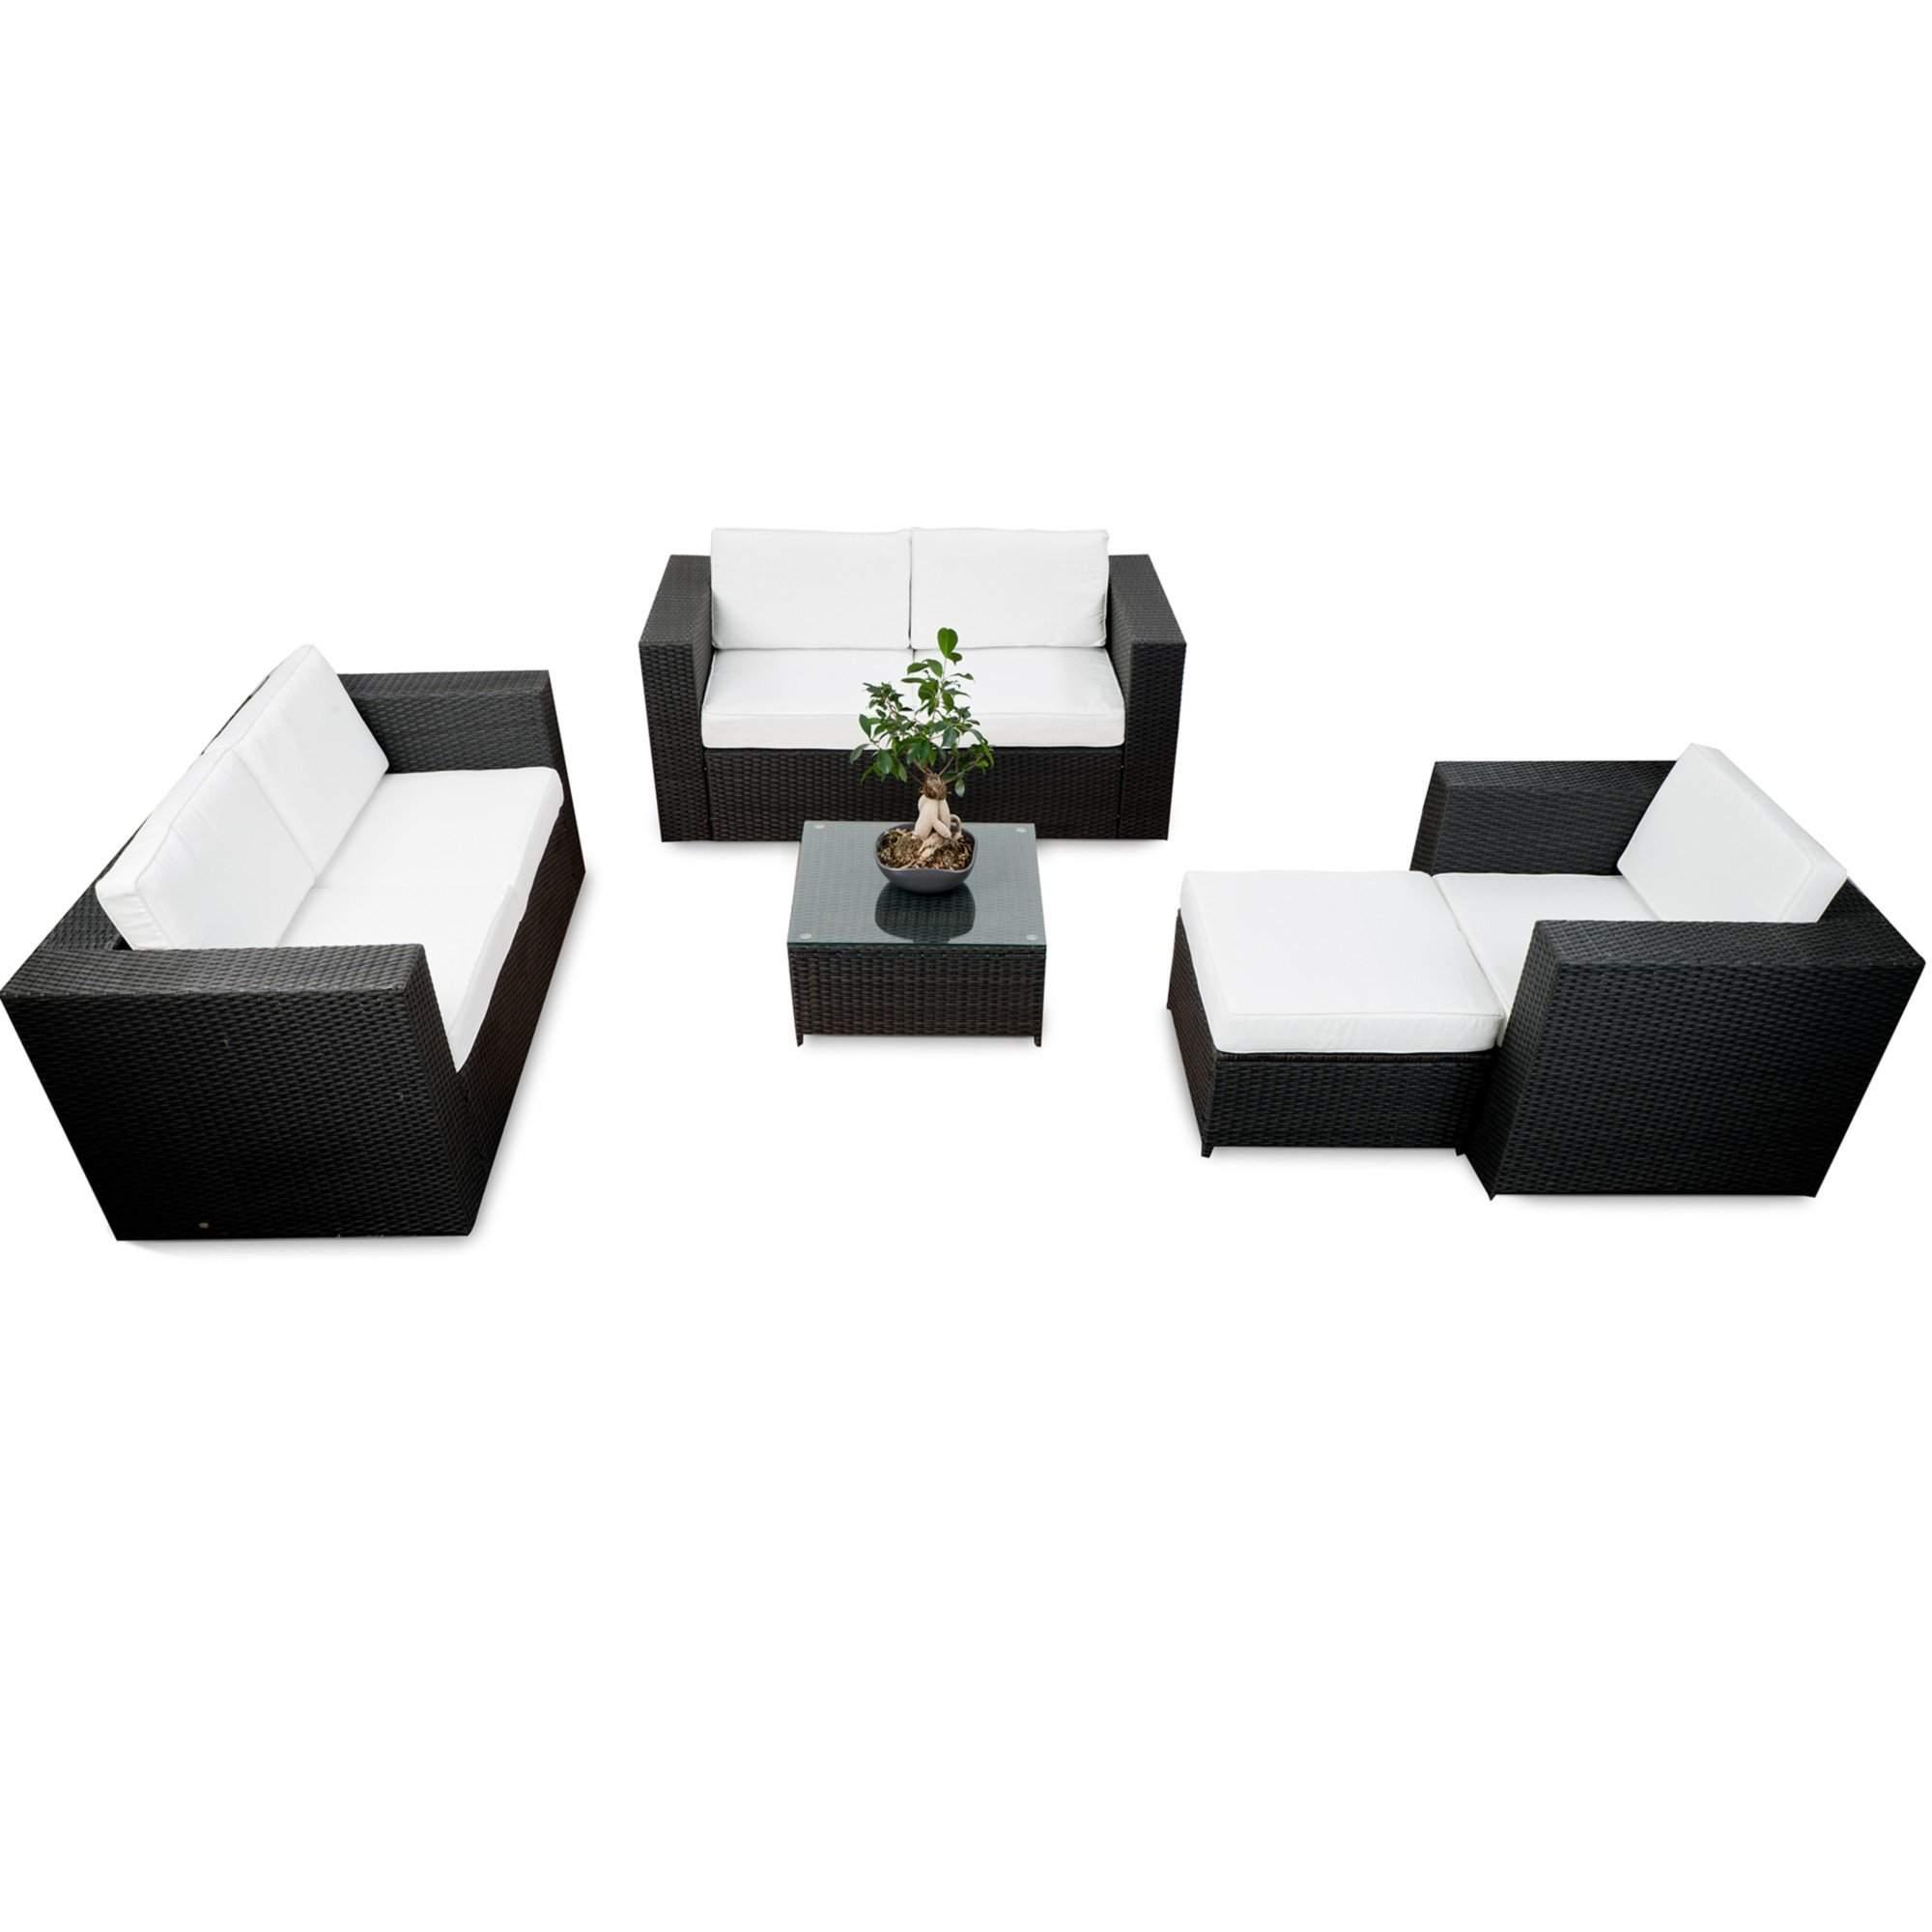 garten lounge set rattan neu 17 tlg lounge set rattan ac29cc294 l ac29cc294 anthrazit of garten lounge set rattan